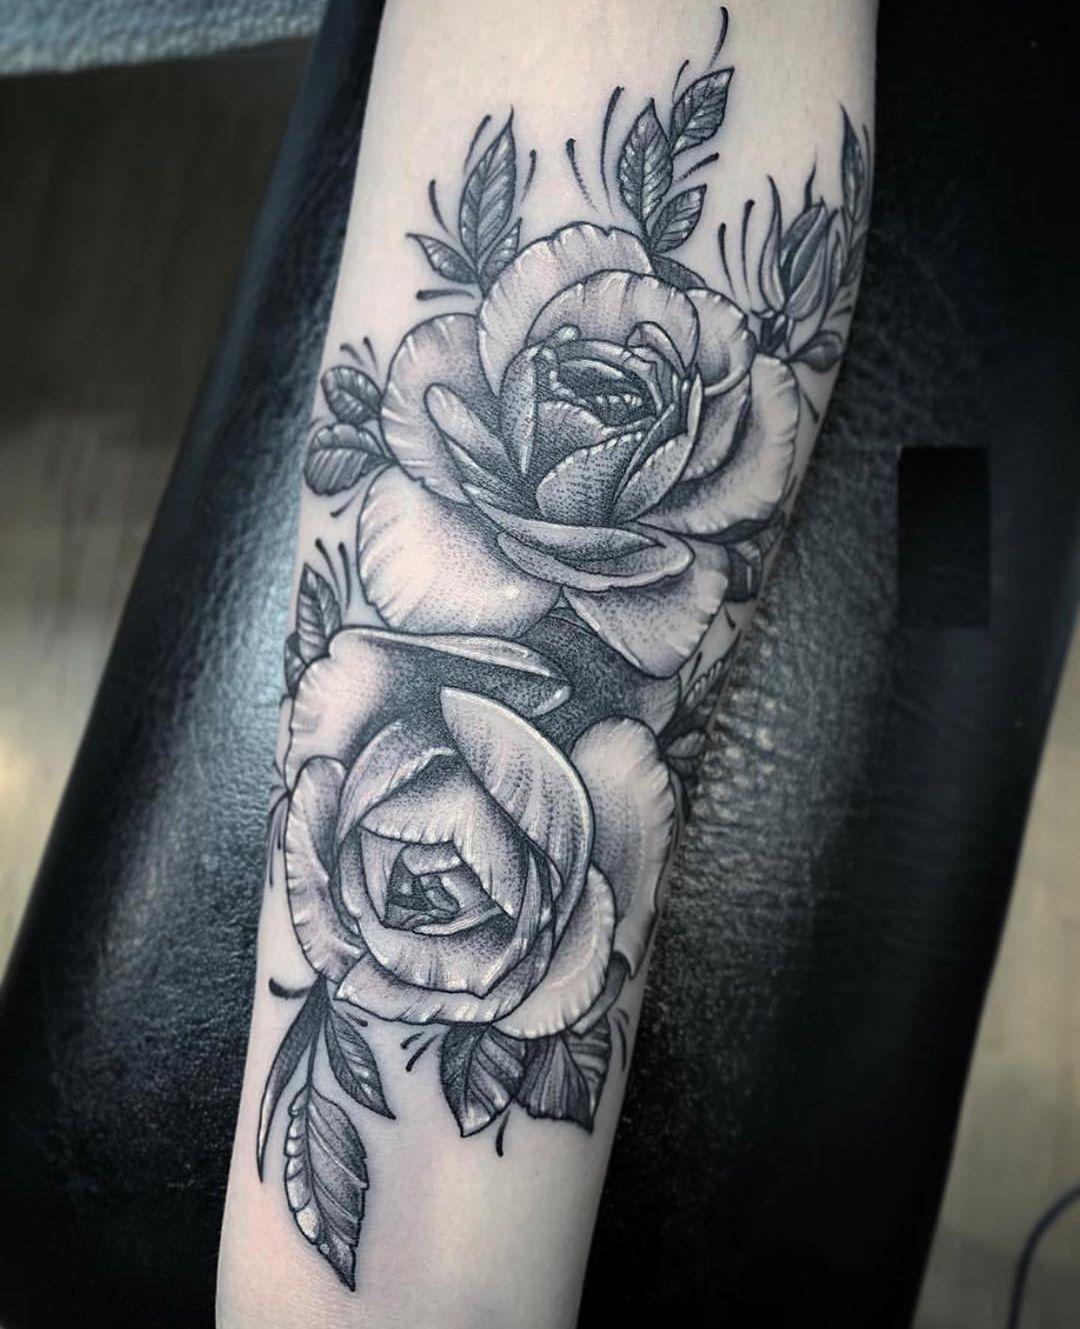 stipple roses party 🖐🌹🤘🏼. .  #flowertattoo#rose#rosetattoo#tattoo#tattooflash#blackandgrey#flowers#flowertattoos#instaflowers#instaflash#tattooart#tattoodesigns#uselesshashtag#guyswithtattoos#tattoosofinstagram#tattoostyle#bestink#instacool#tomsriverlocal#allsaintstattoonj#briandicolatattoos